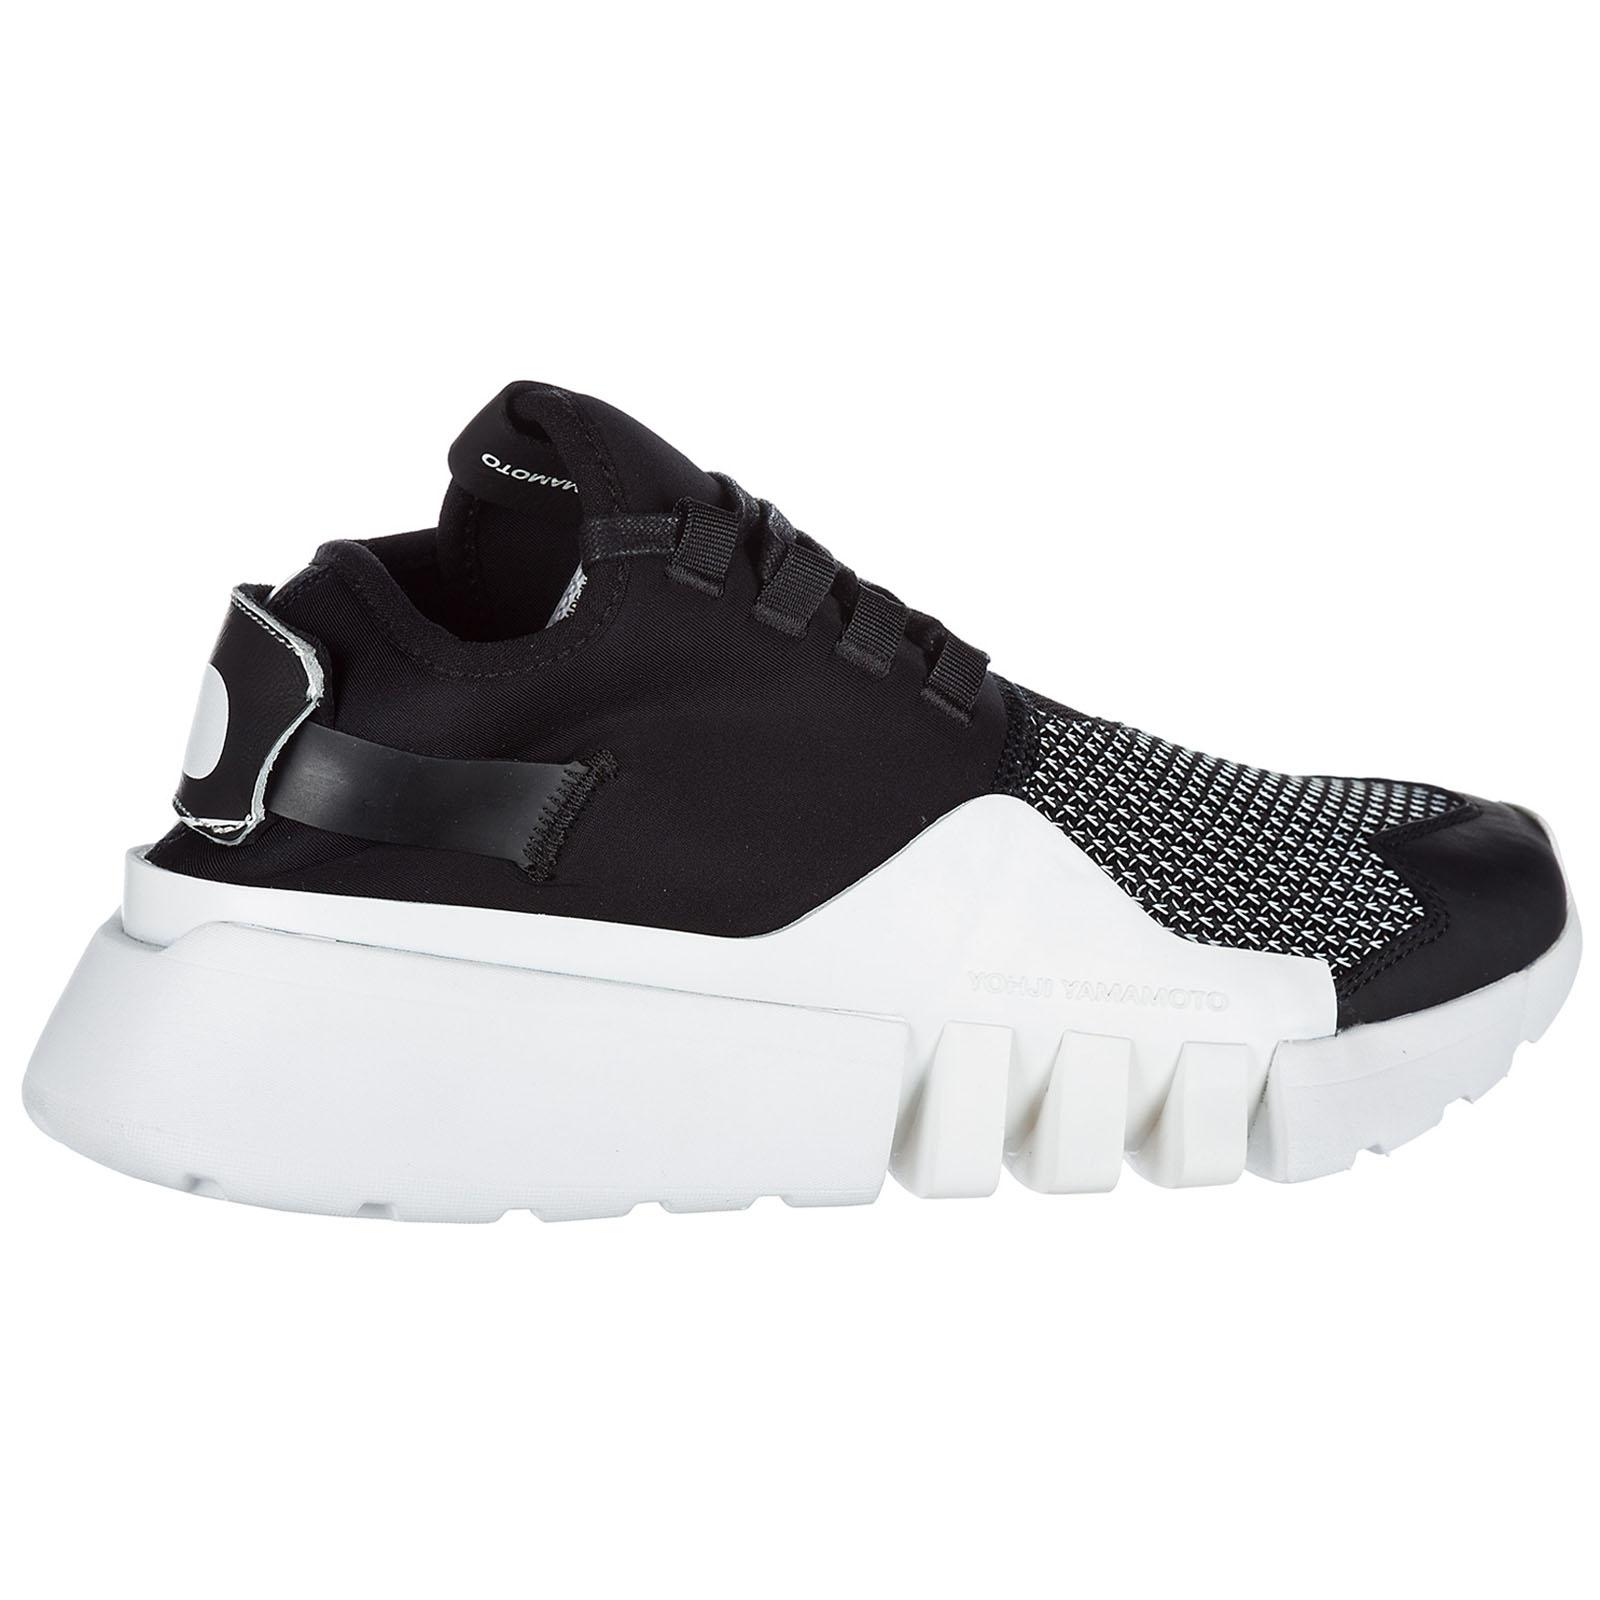 2380d21ec y-3-Nero-Shoes-Trainers-Sneakers-Yohji-Yamamoto-Ayero.jpeg